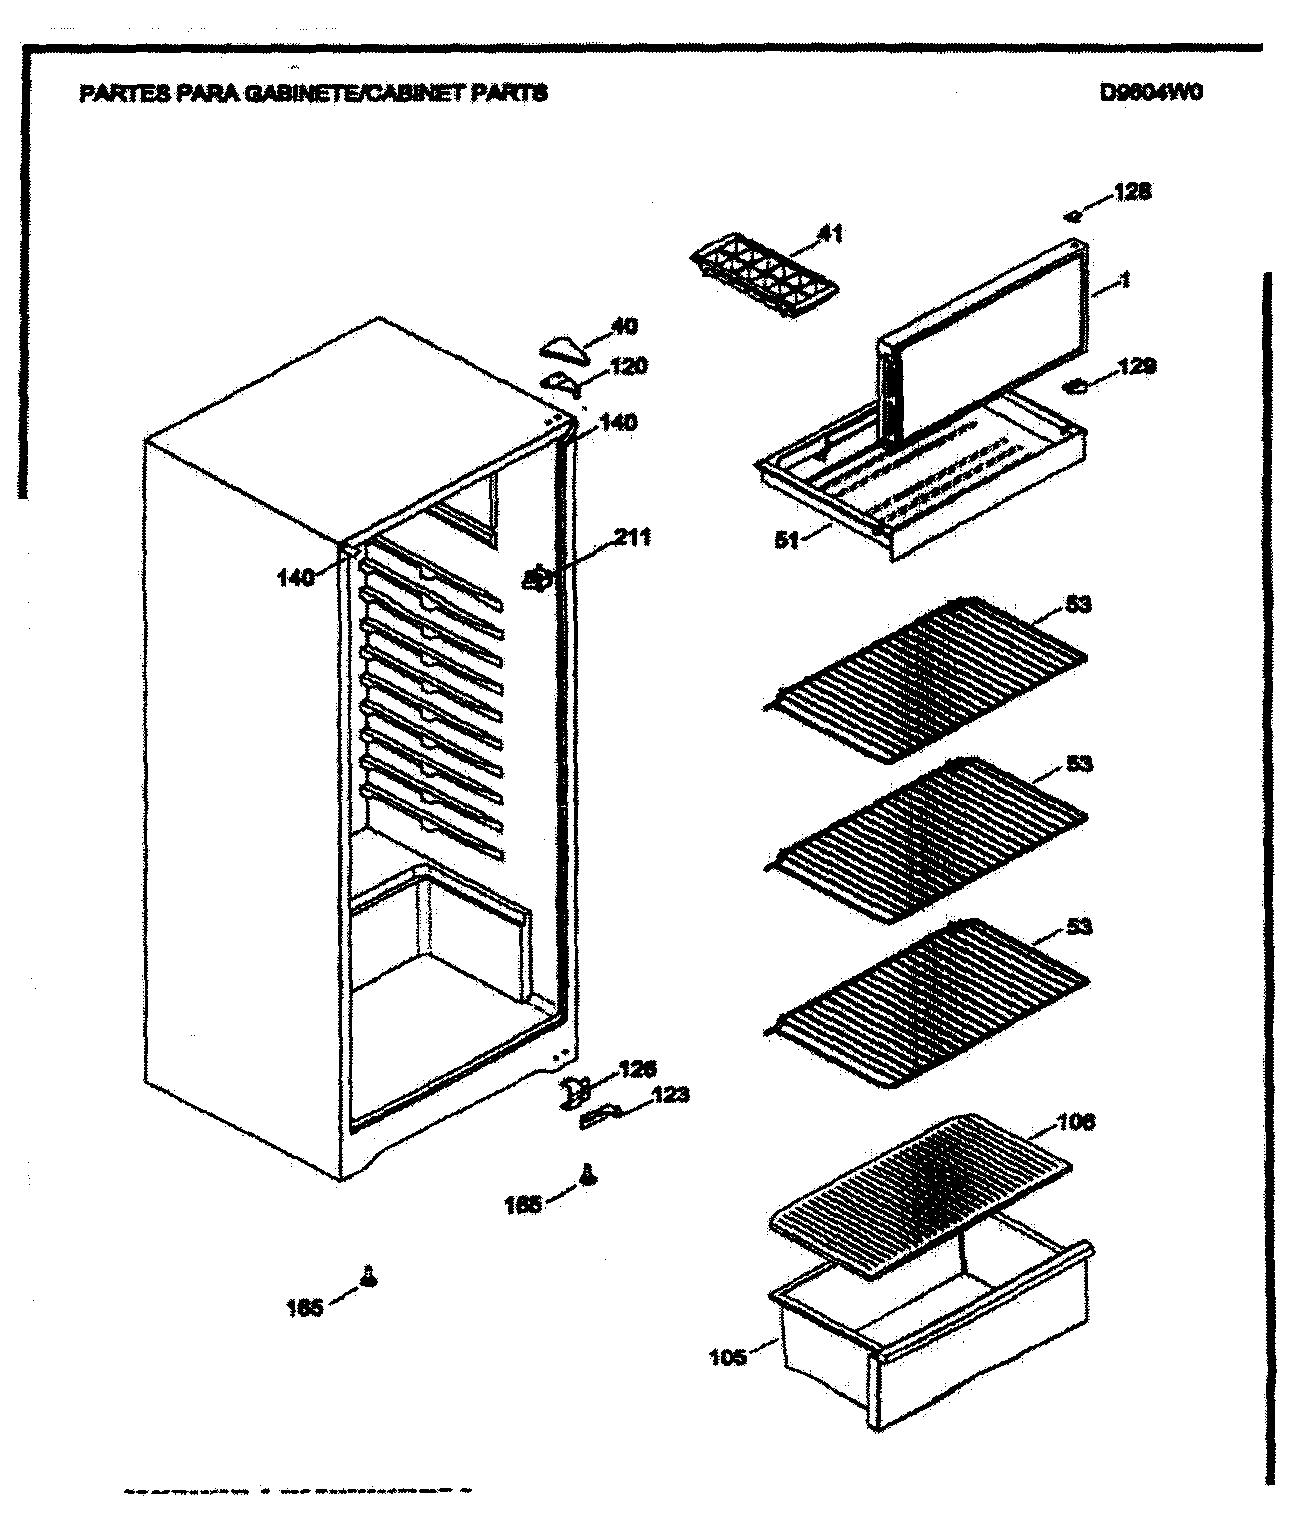 Danby model D9604W all refrigerator genuine parts